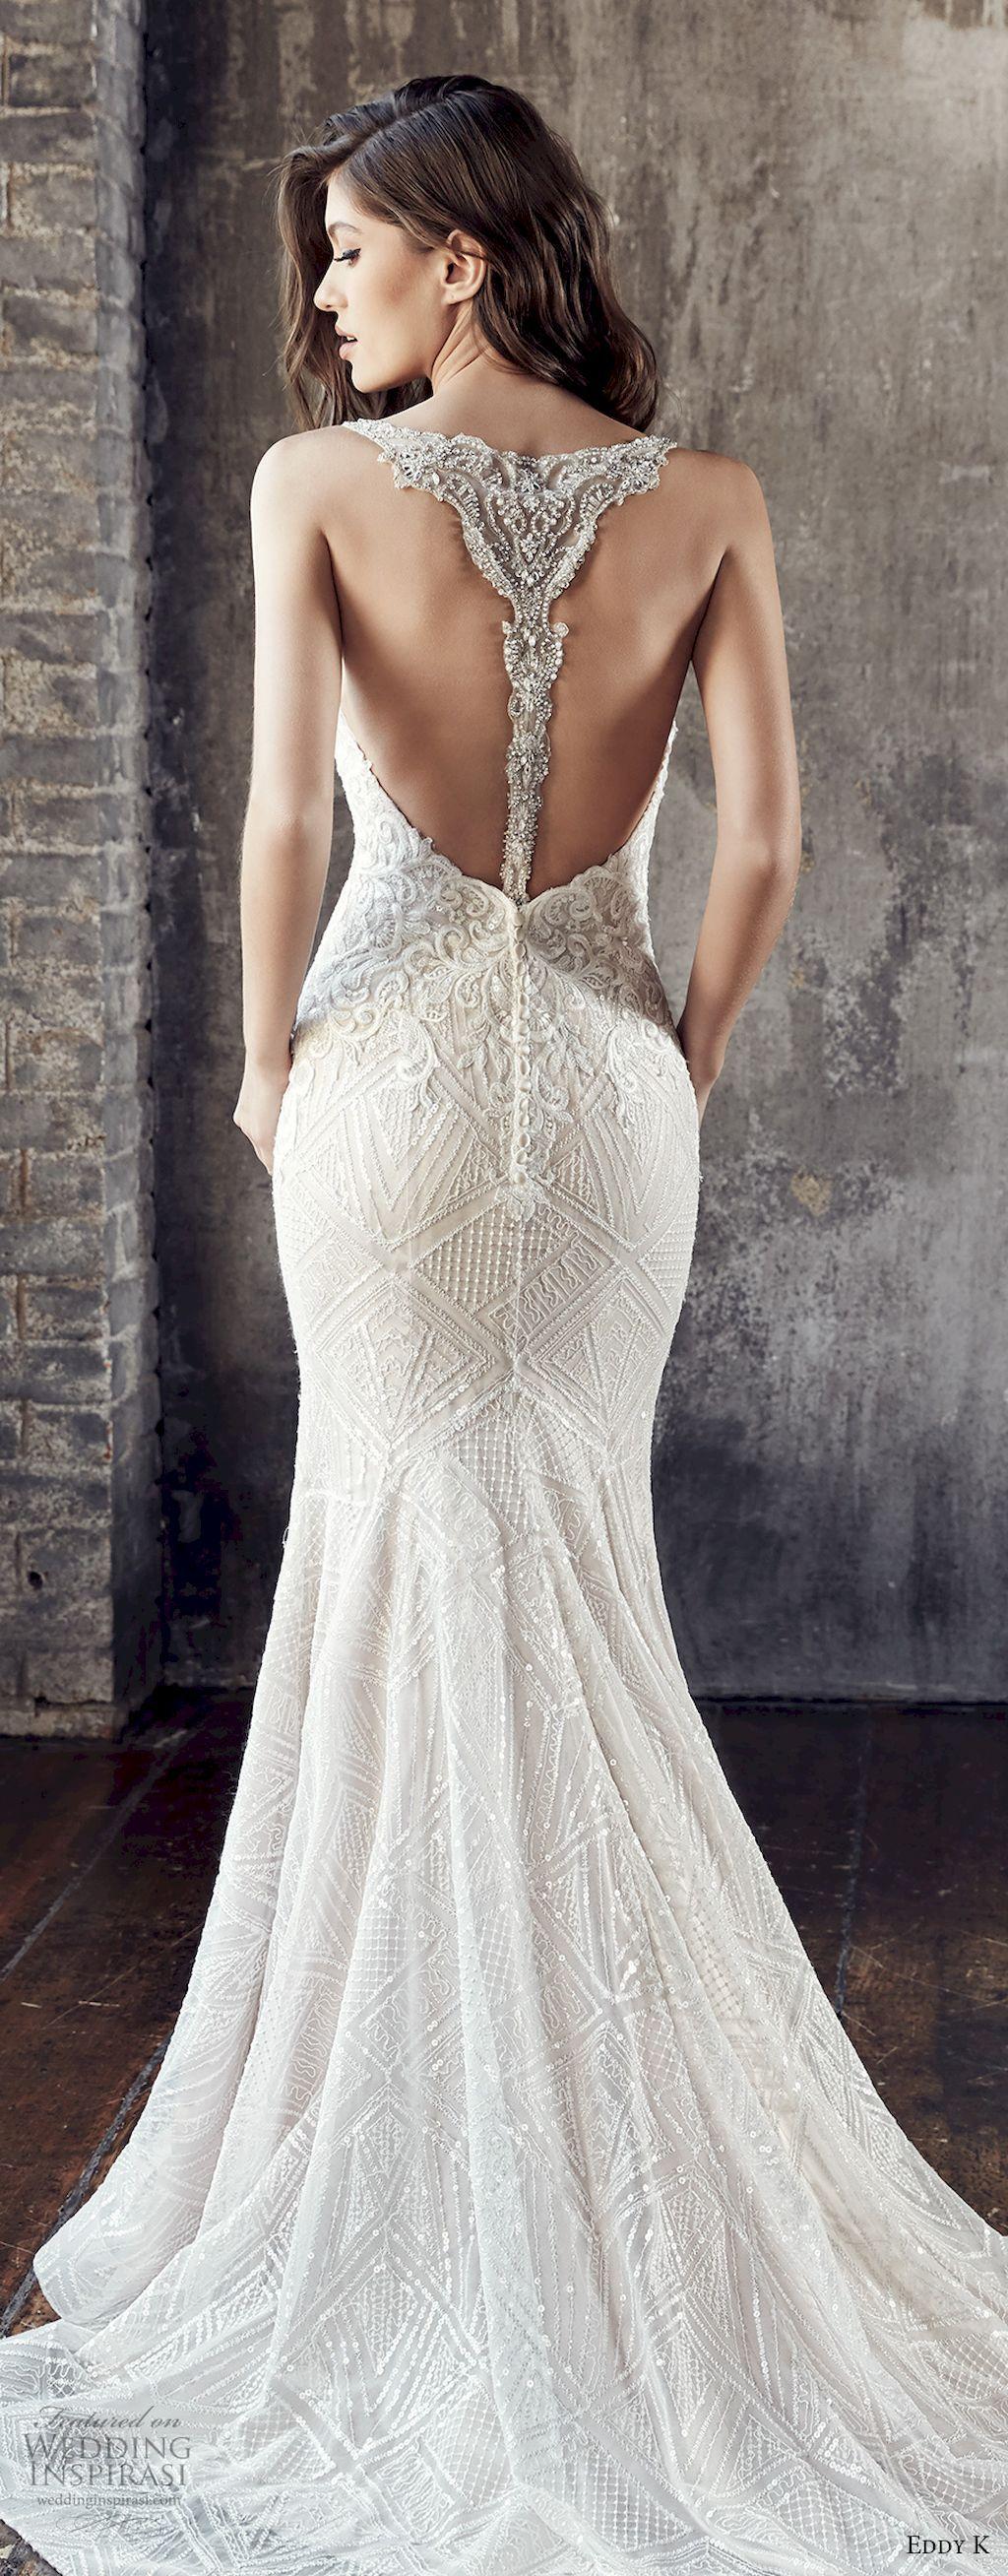 gorgeous backless wedding dresses design ideas backless wedding